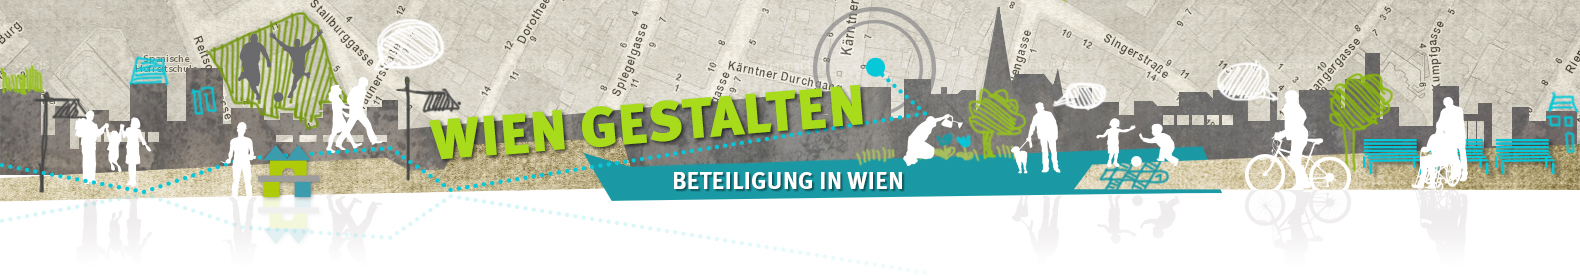 Beteiligung in Wien